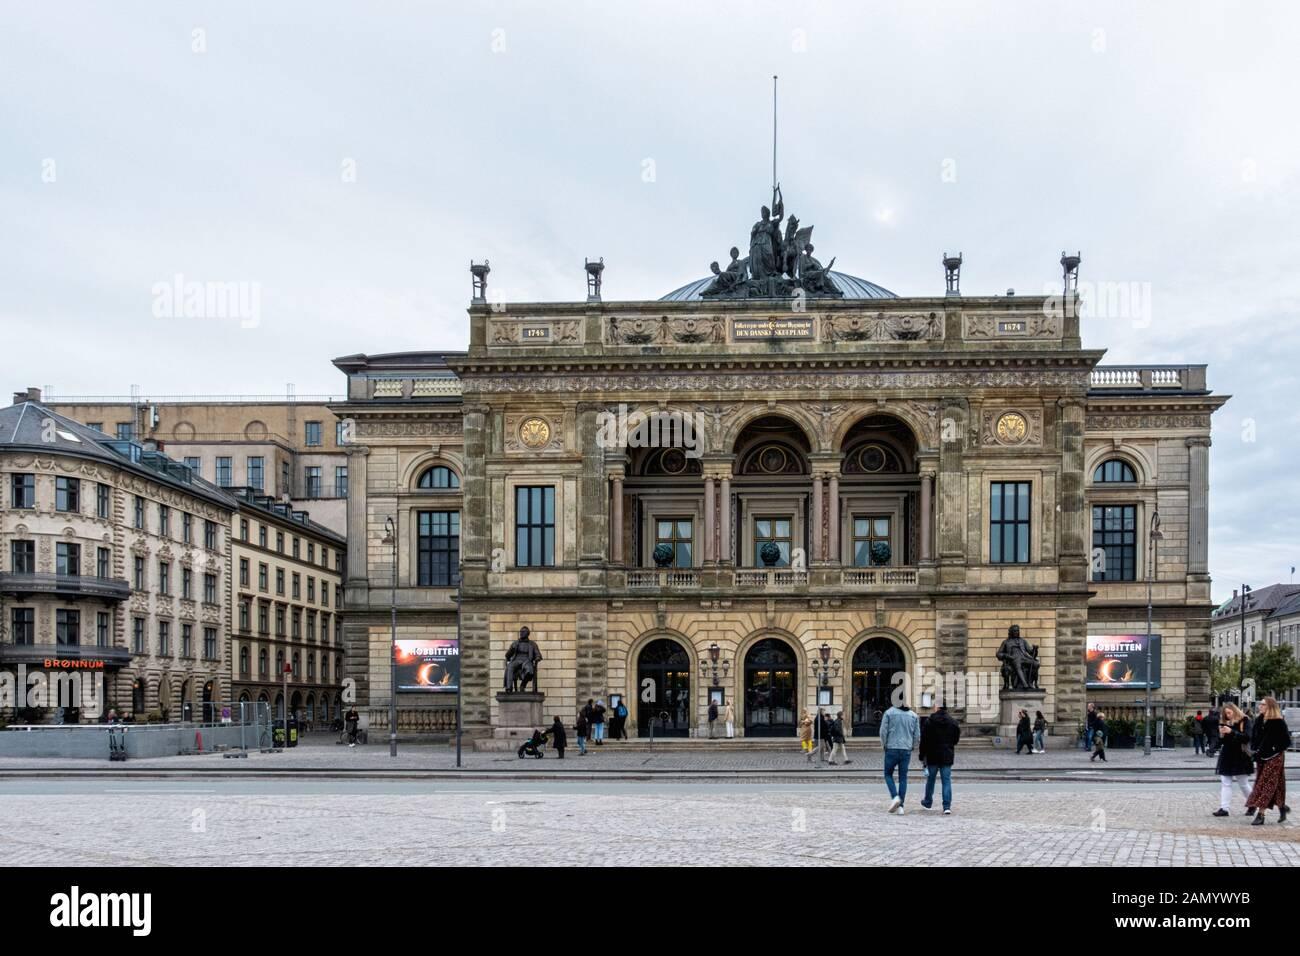 Royal Danish Theatre current building built 1872–74 and designed by Wilhelm Dahlerup on Kongens Nytorv 1, Copenhagen, Denmark Stock Photo